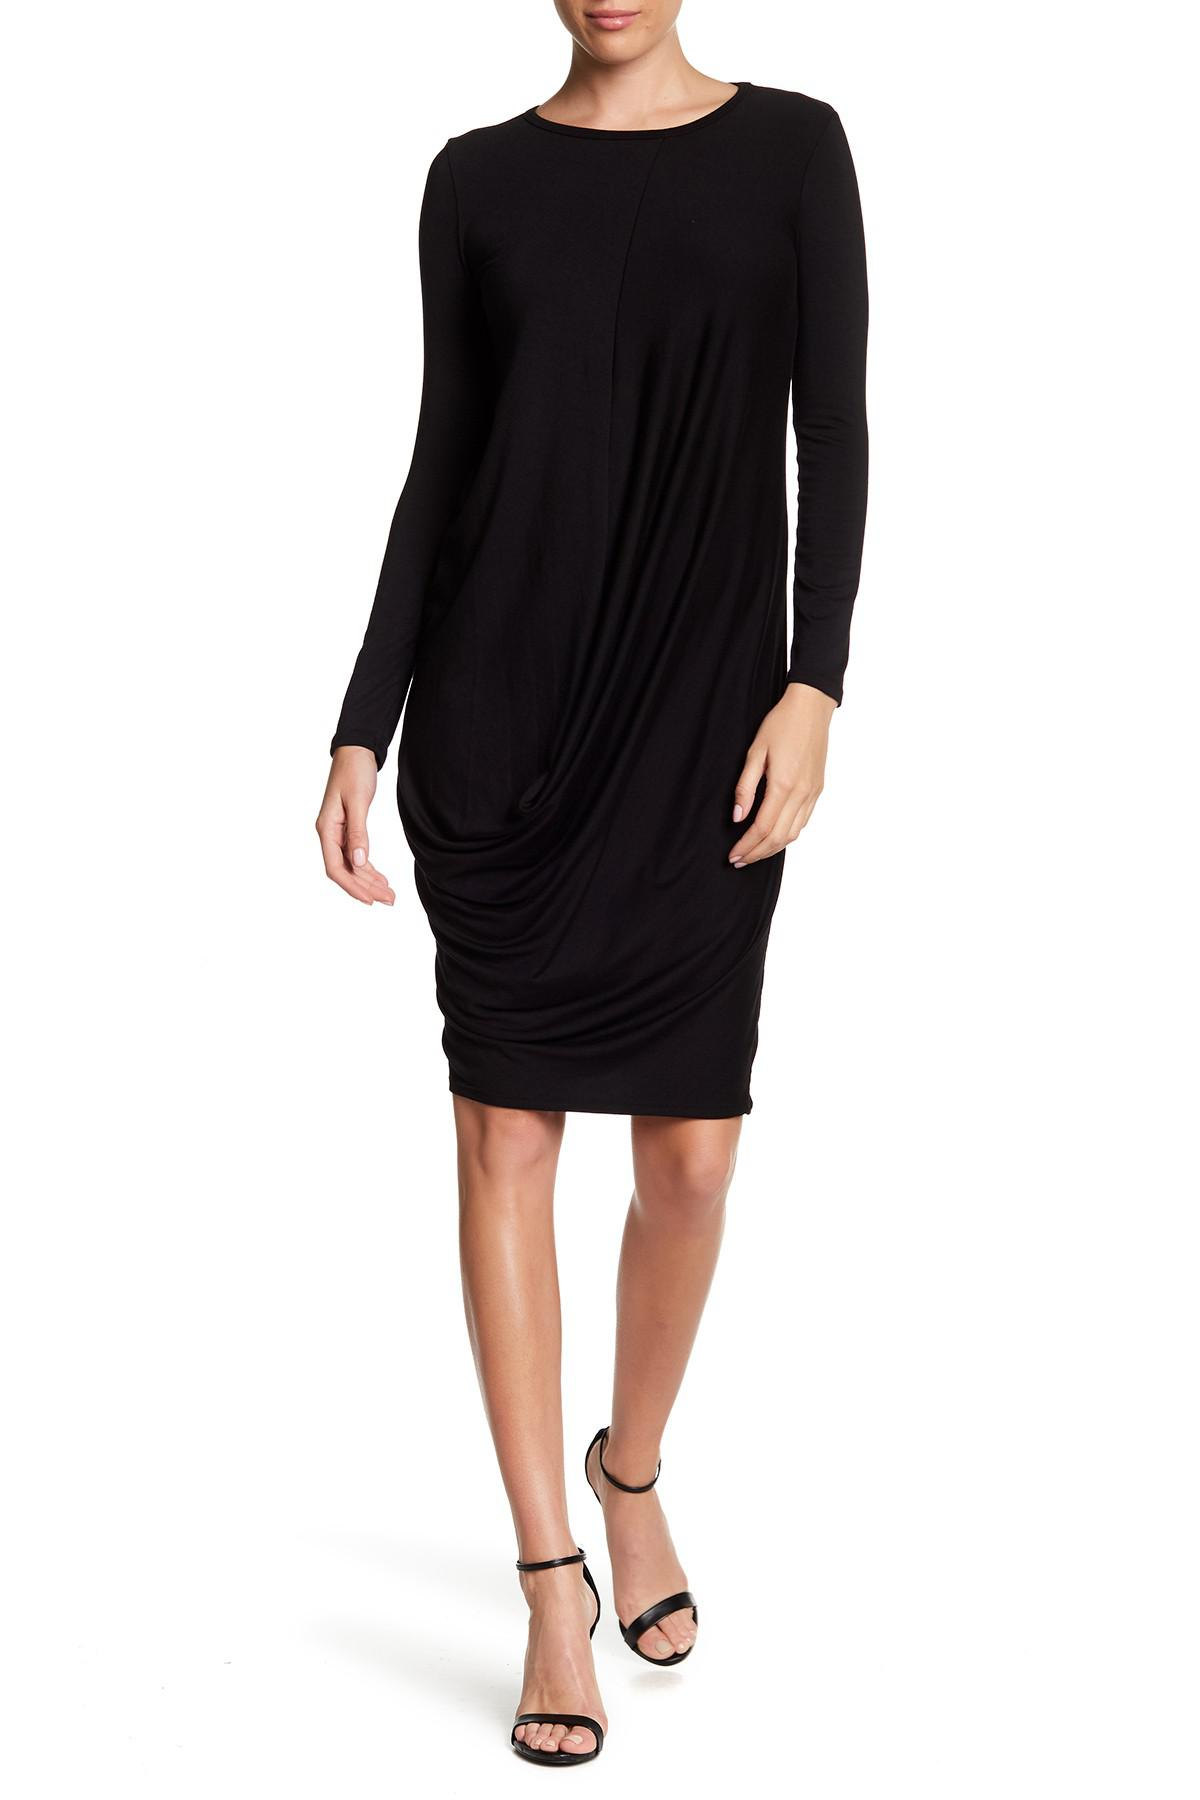 6e5a012cd83 Go Couture Draped Bubble Hem Dress in Black - Lyst